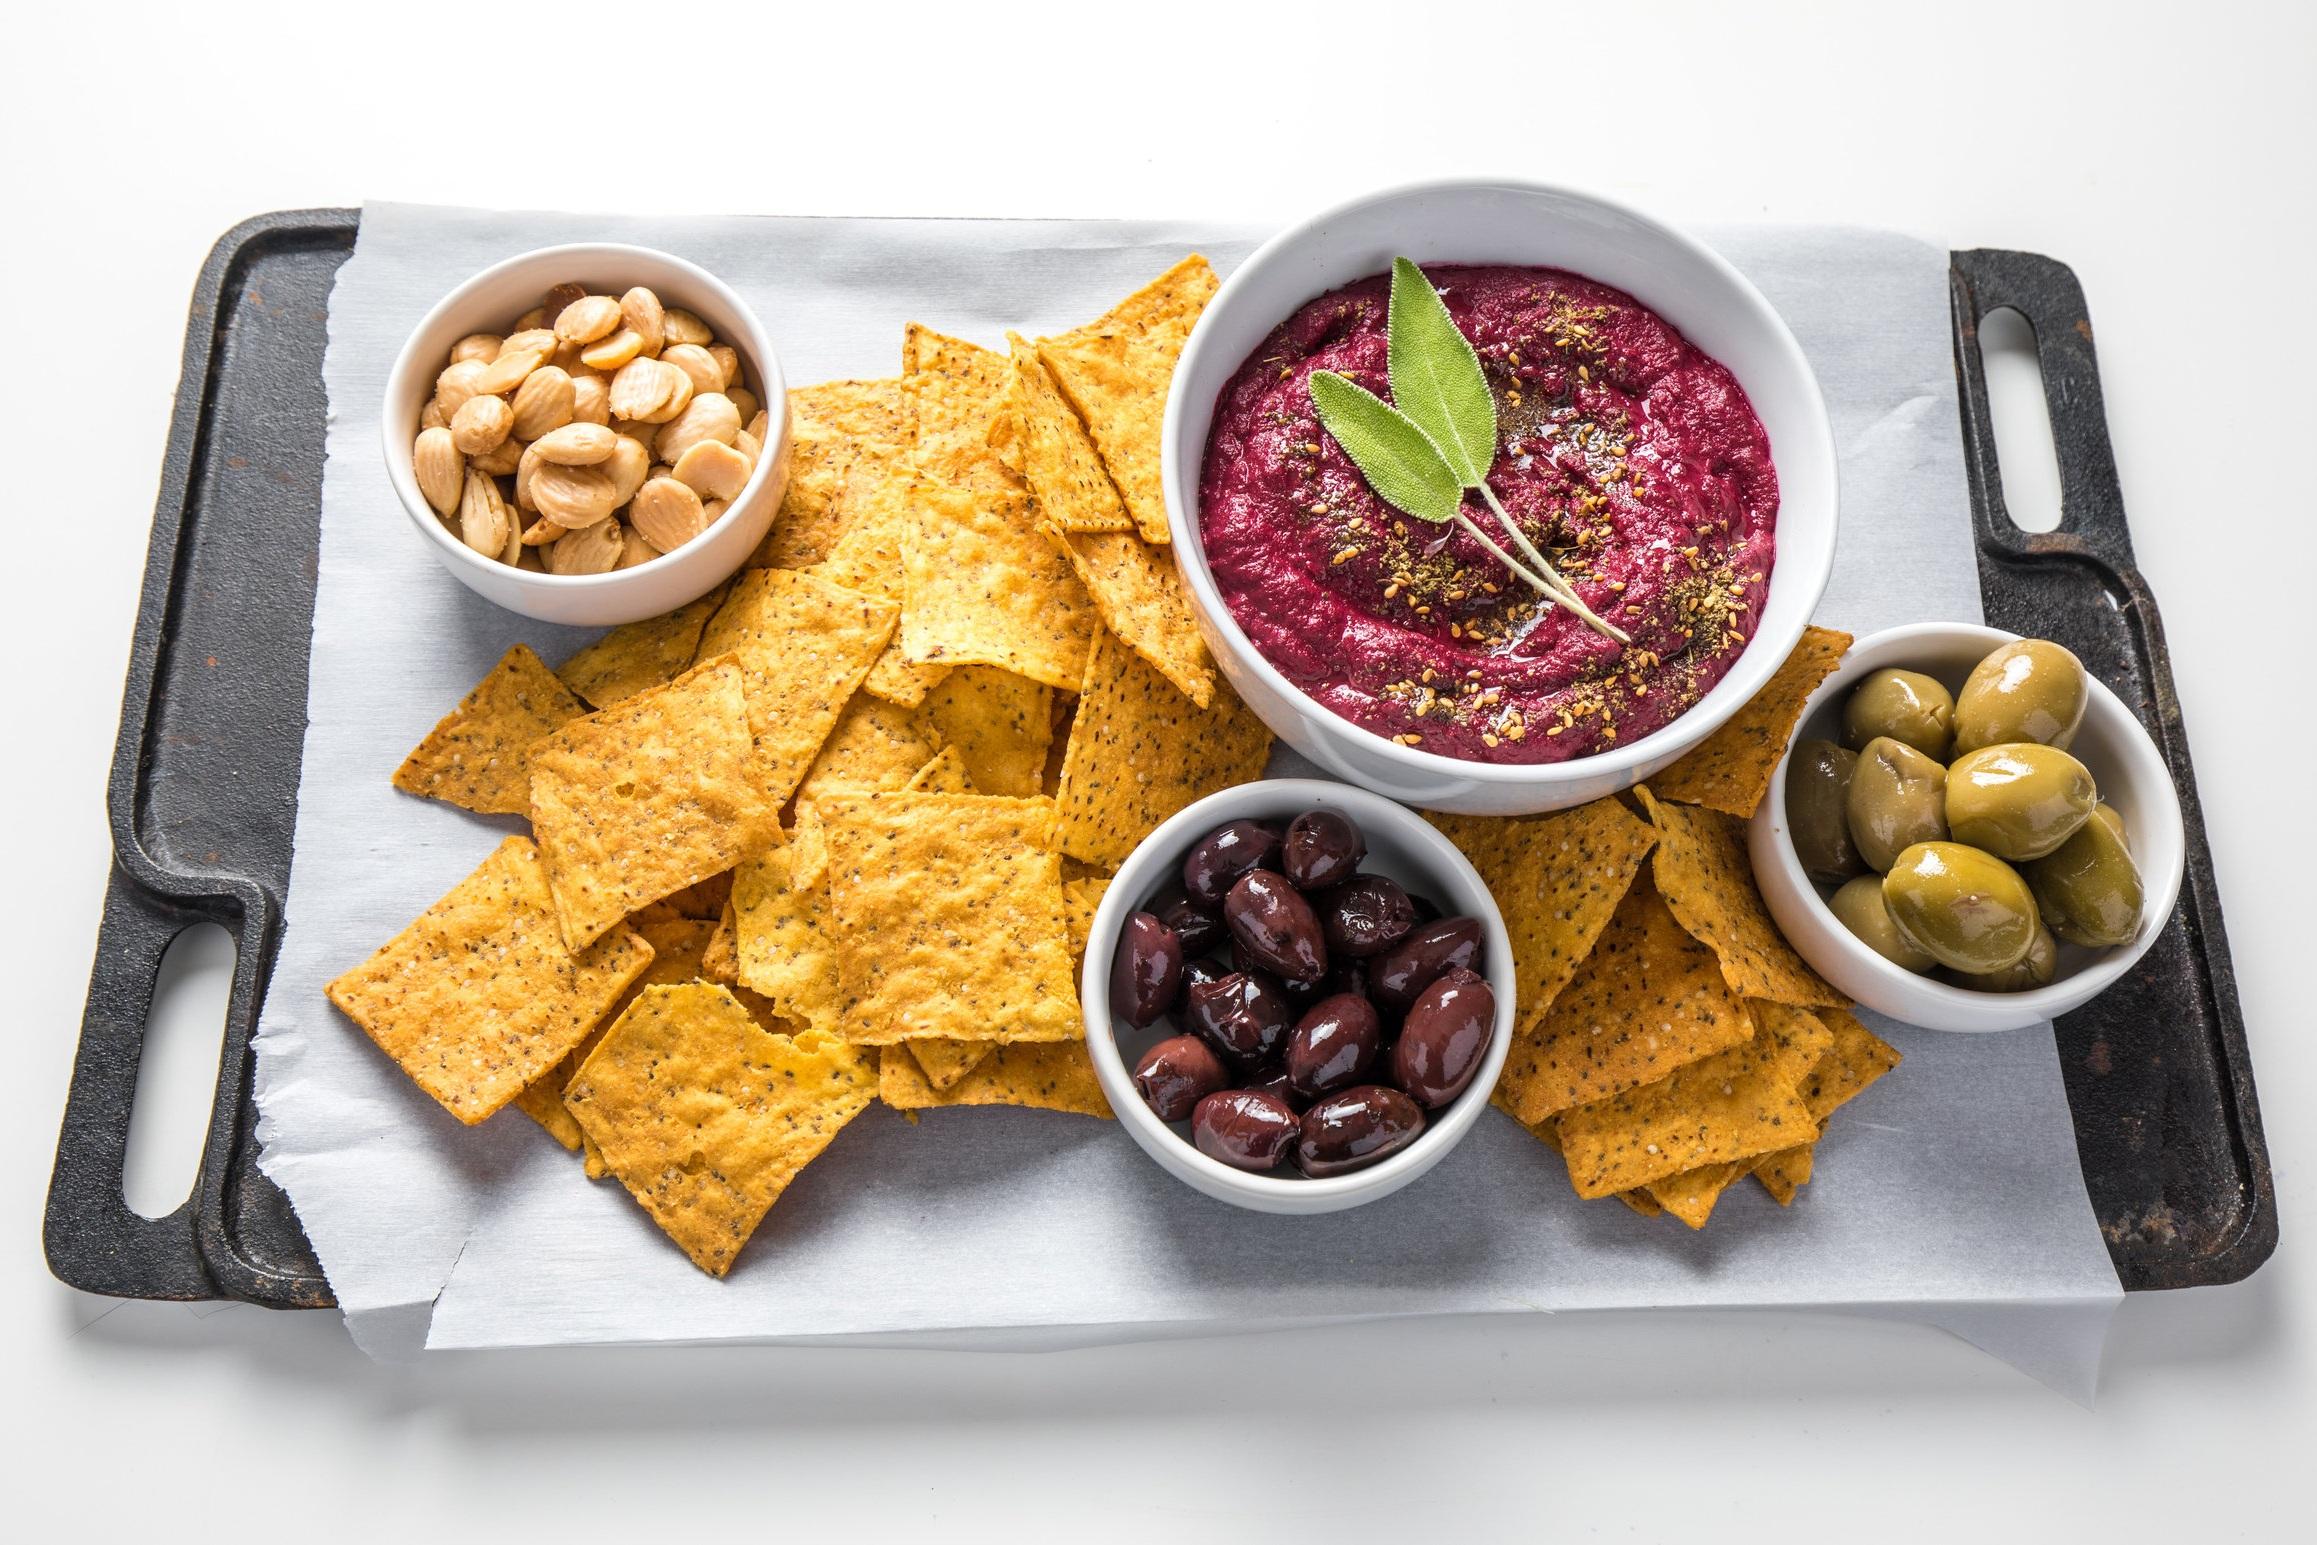 Beet+Hummus+Recipe+without+Garbanzo+Beans